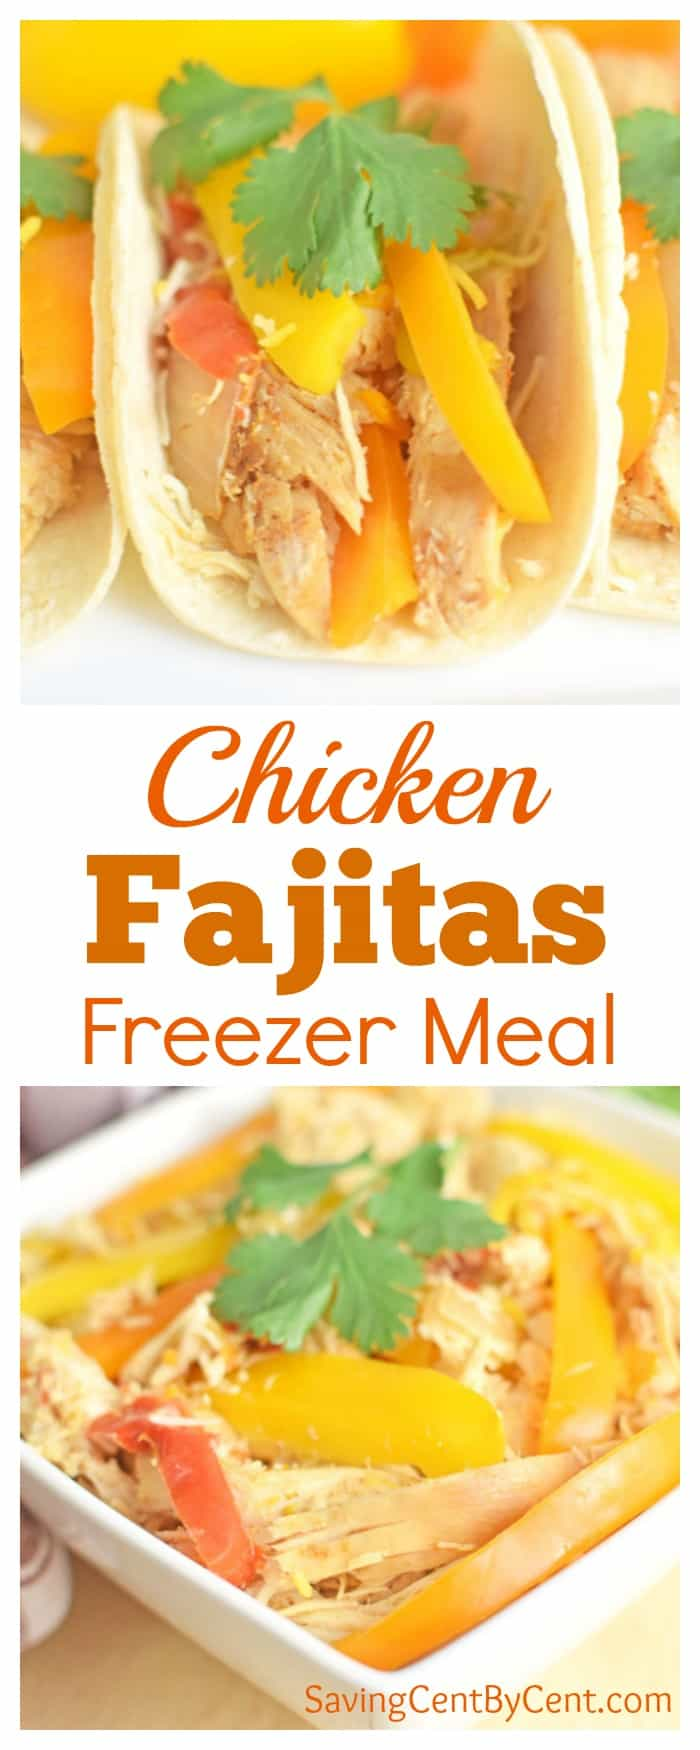 Chicken Fajitas Freezer Meal